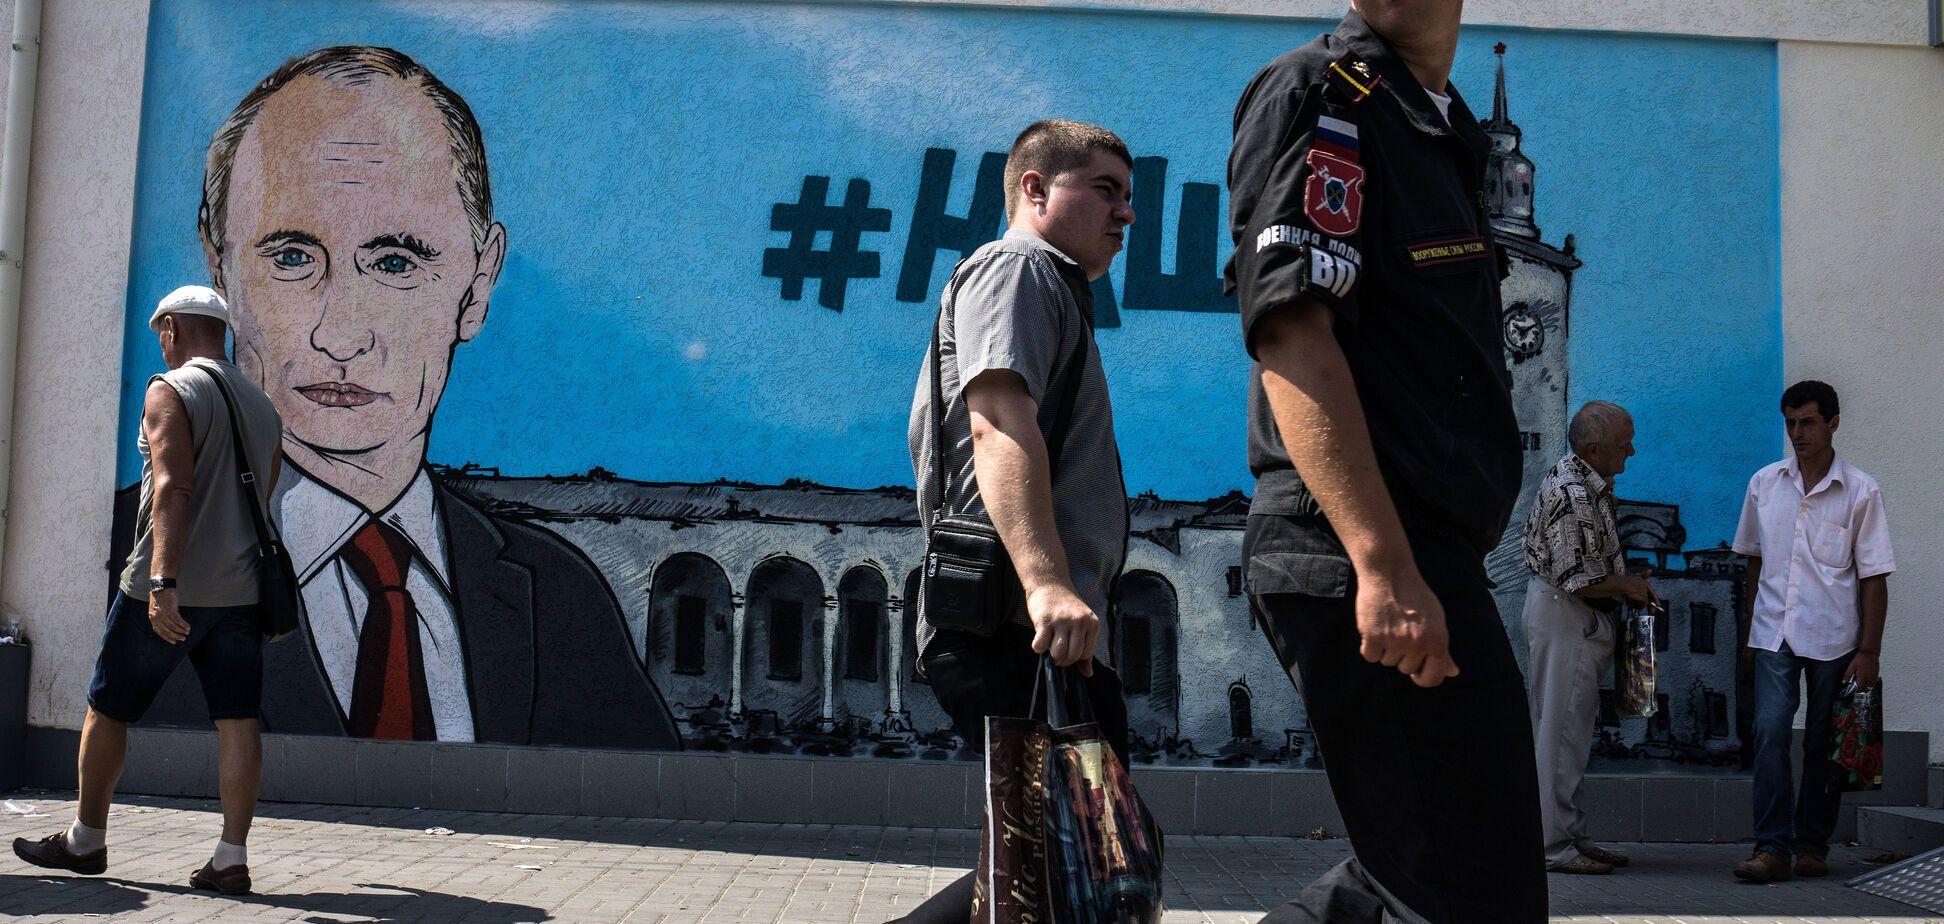 'Кримчан оголосять шпигунами': окупованому півострову пророкують незавидну долю